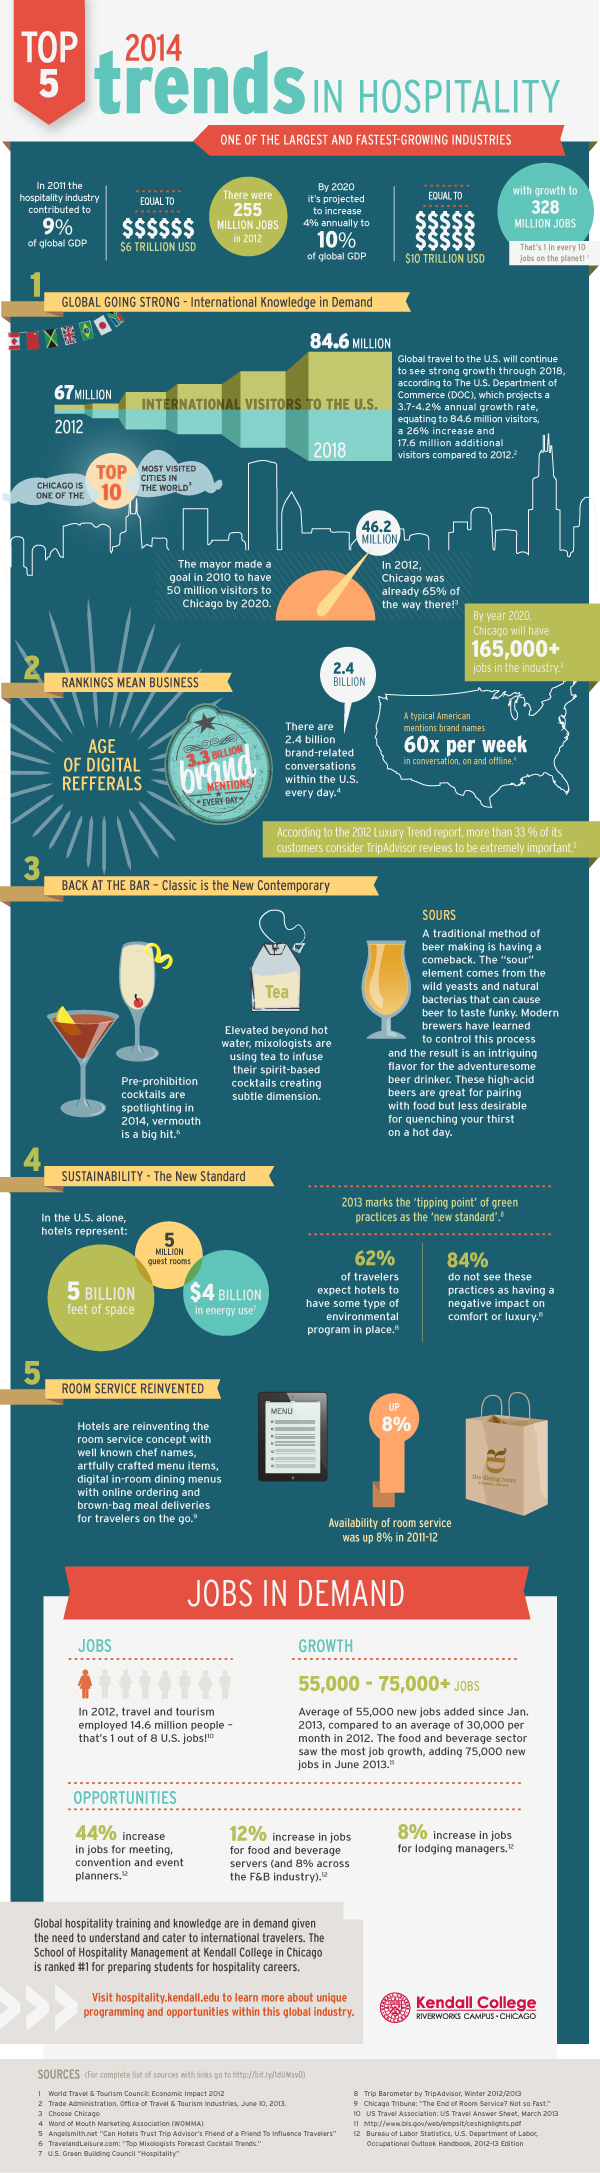 2014 Hospitality Trends